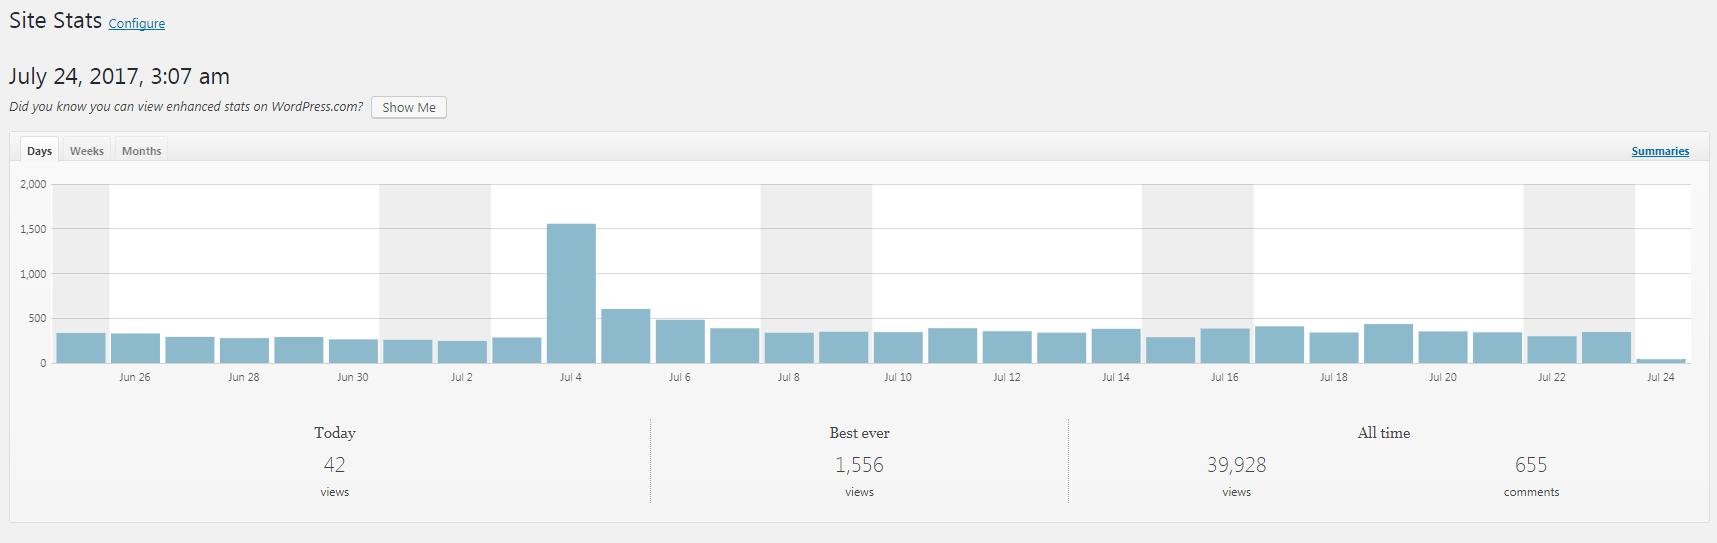 blog traffic in july 2017